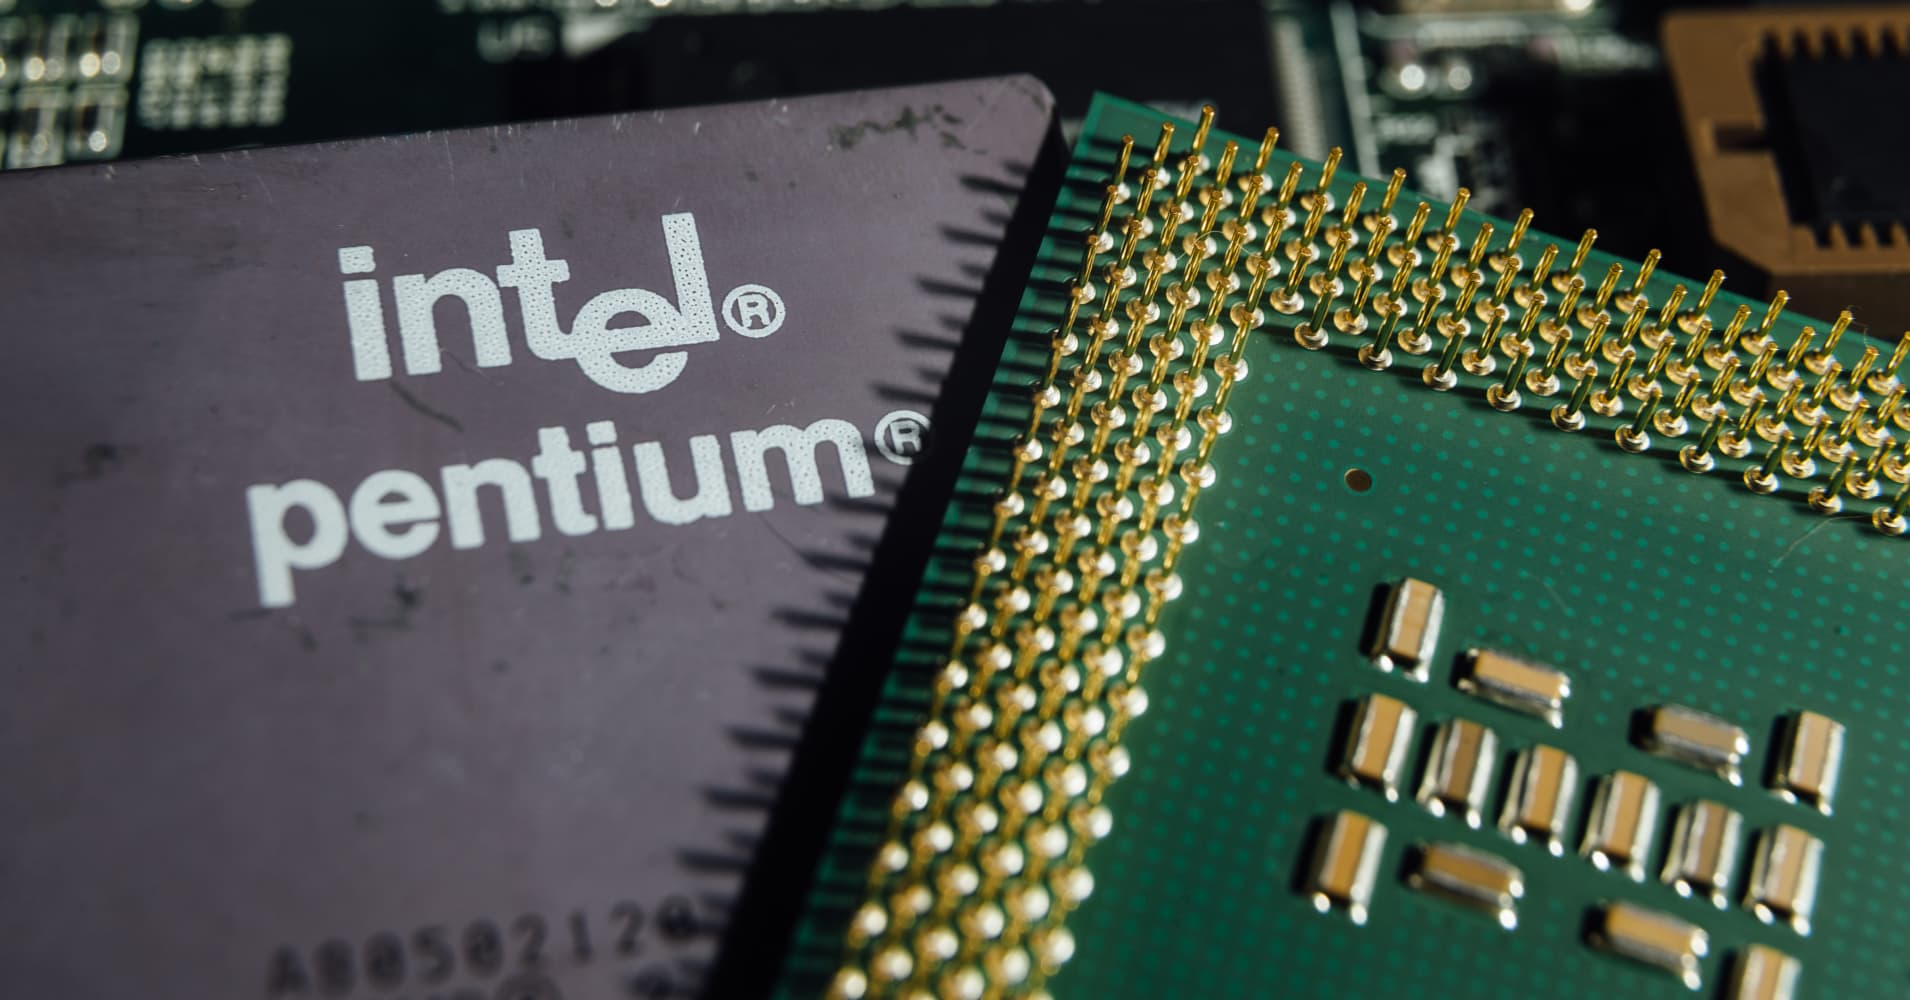 Intel shares gain after Nomura upgrade